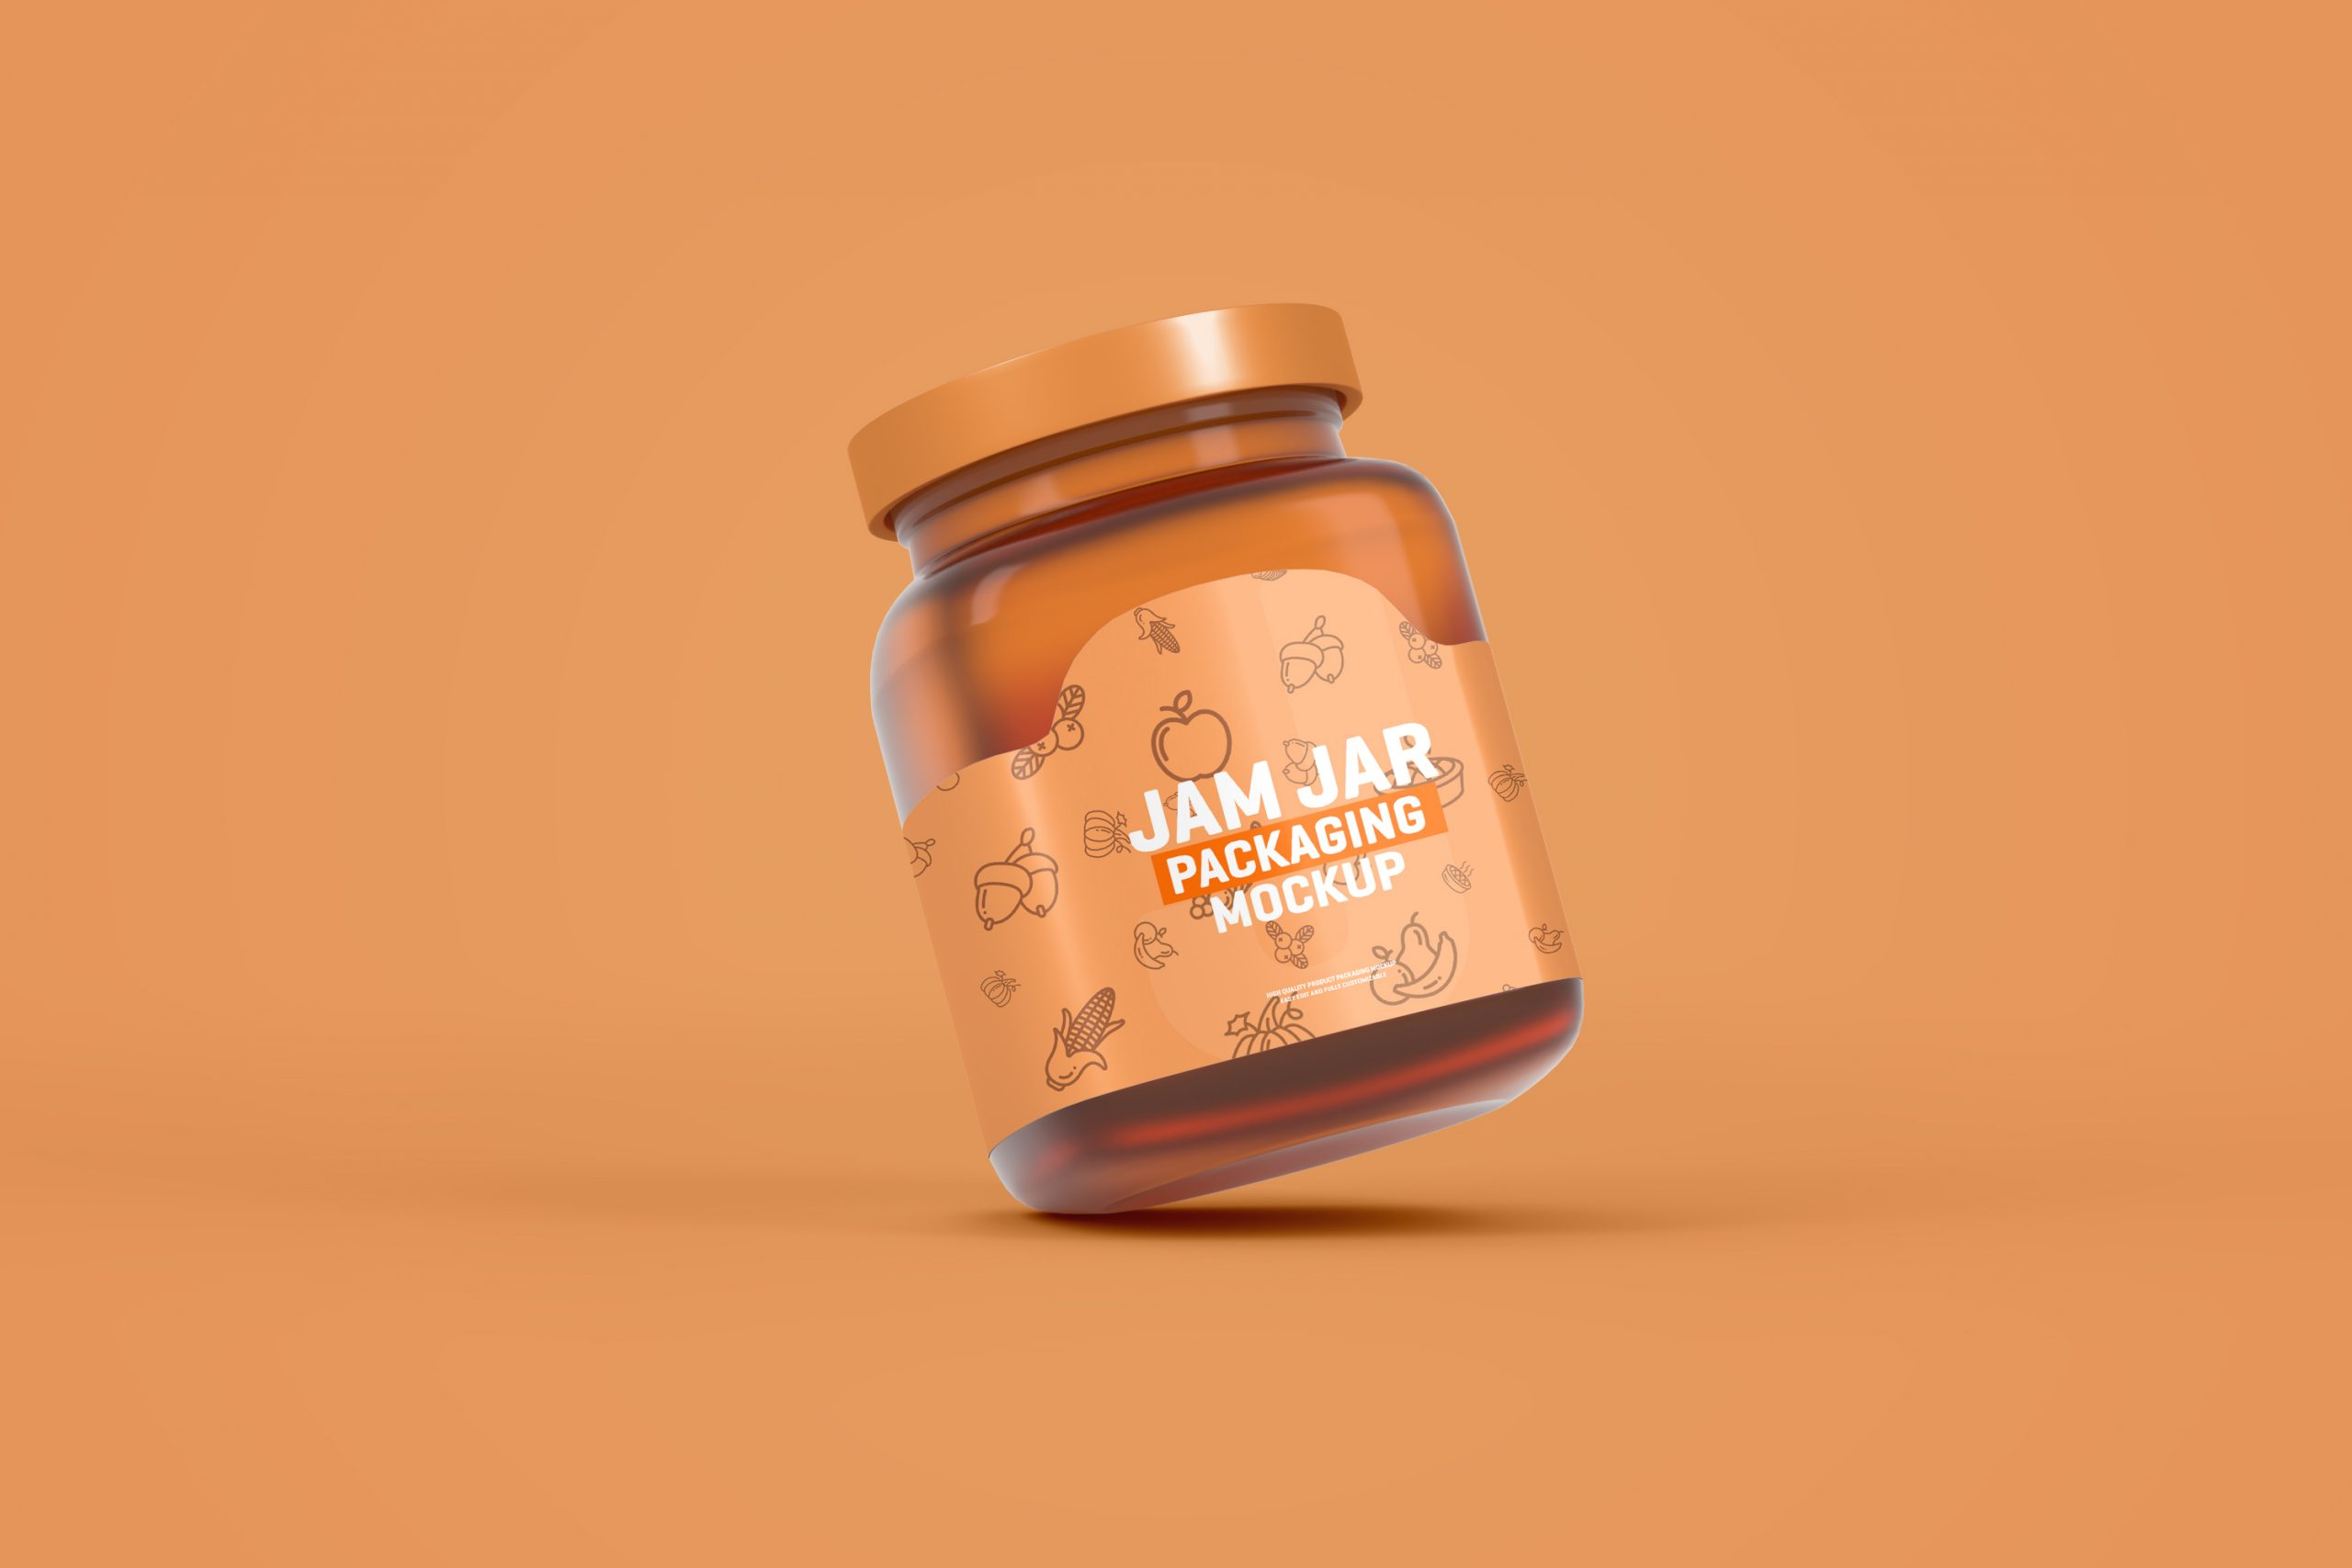 Free Glass Jam Jar Packaging Mockup